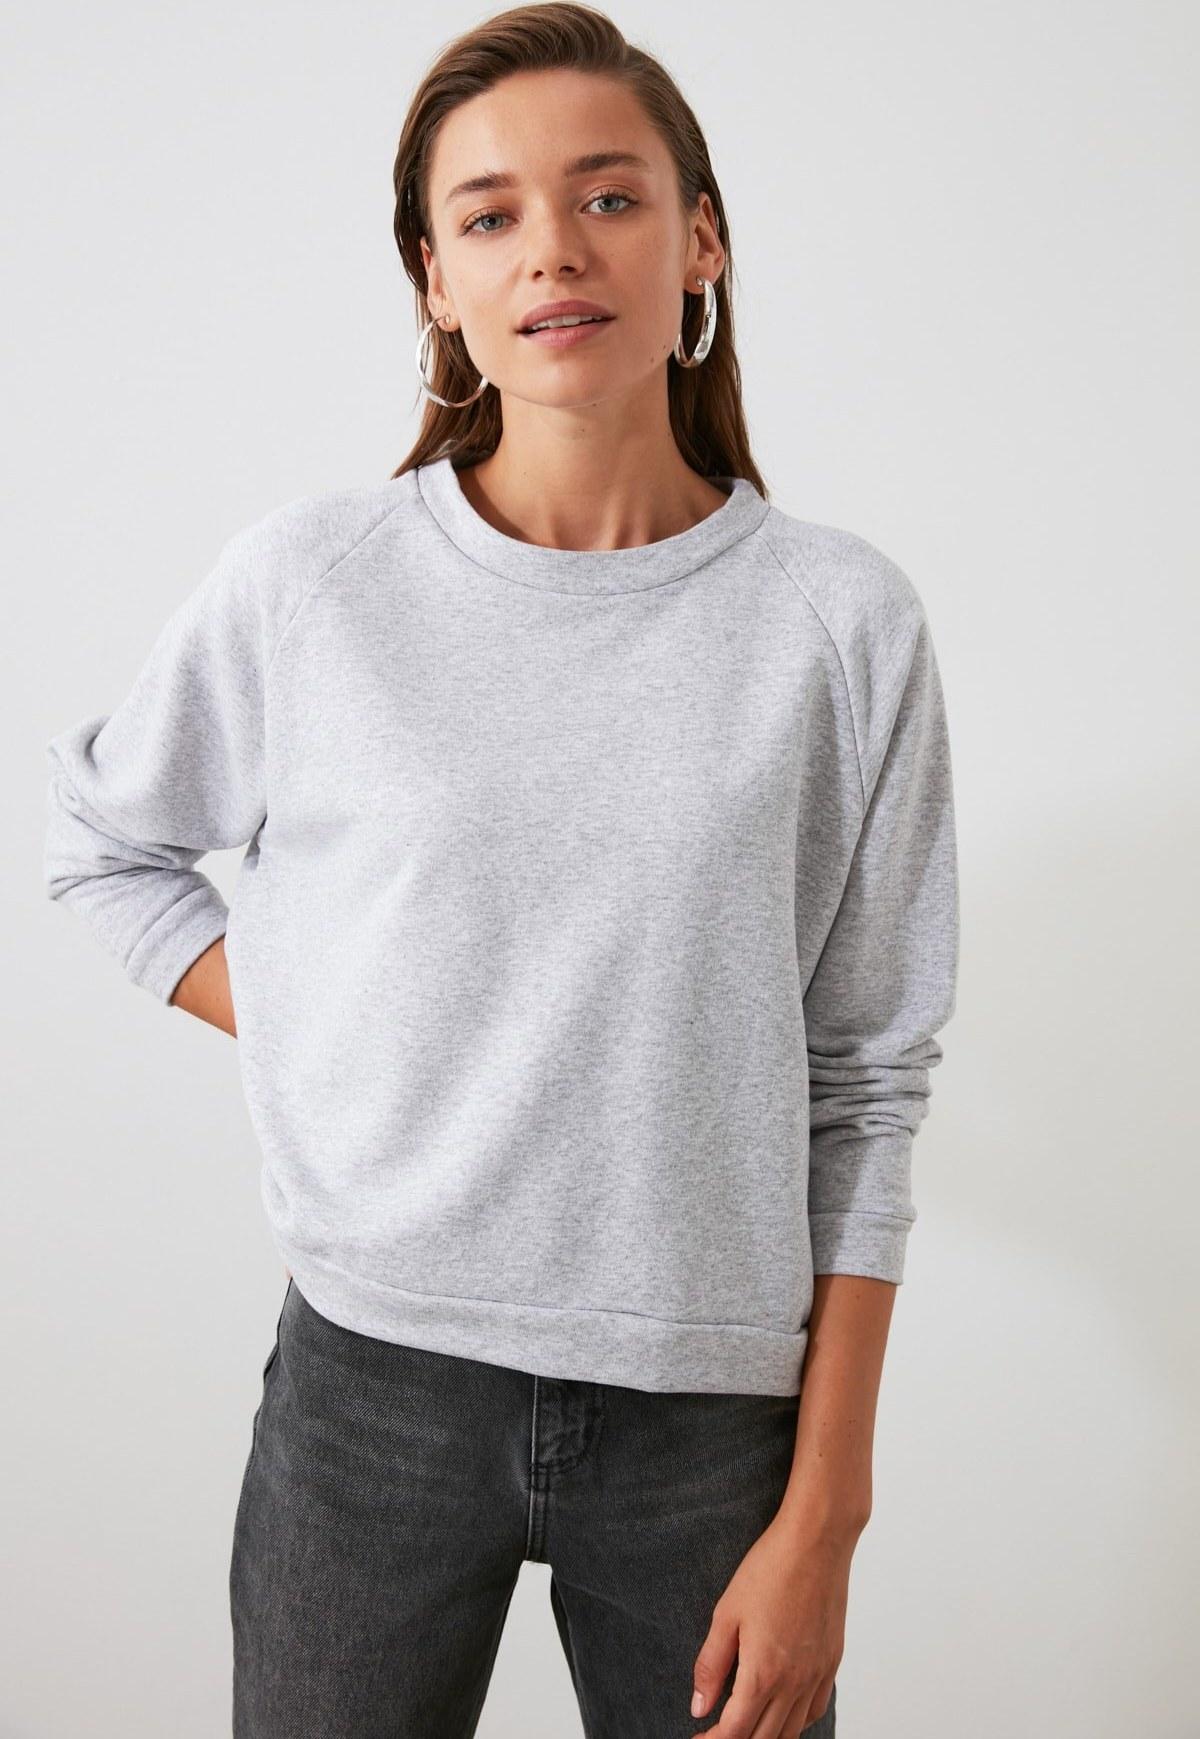 تصویر خرید اینترنتی سویشرت خاص زنانه برند ترندیول میلا رنگ نقره ای کد ty46232183